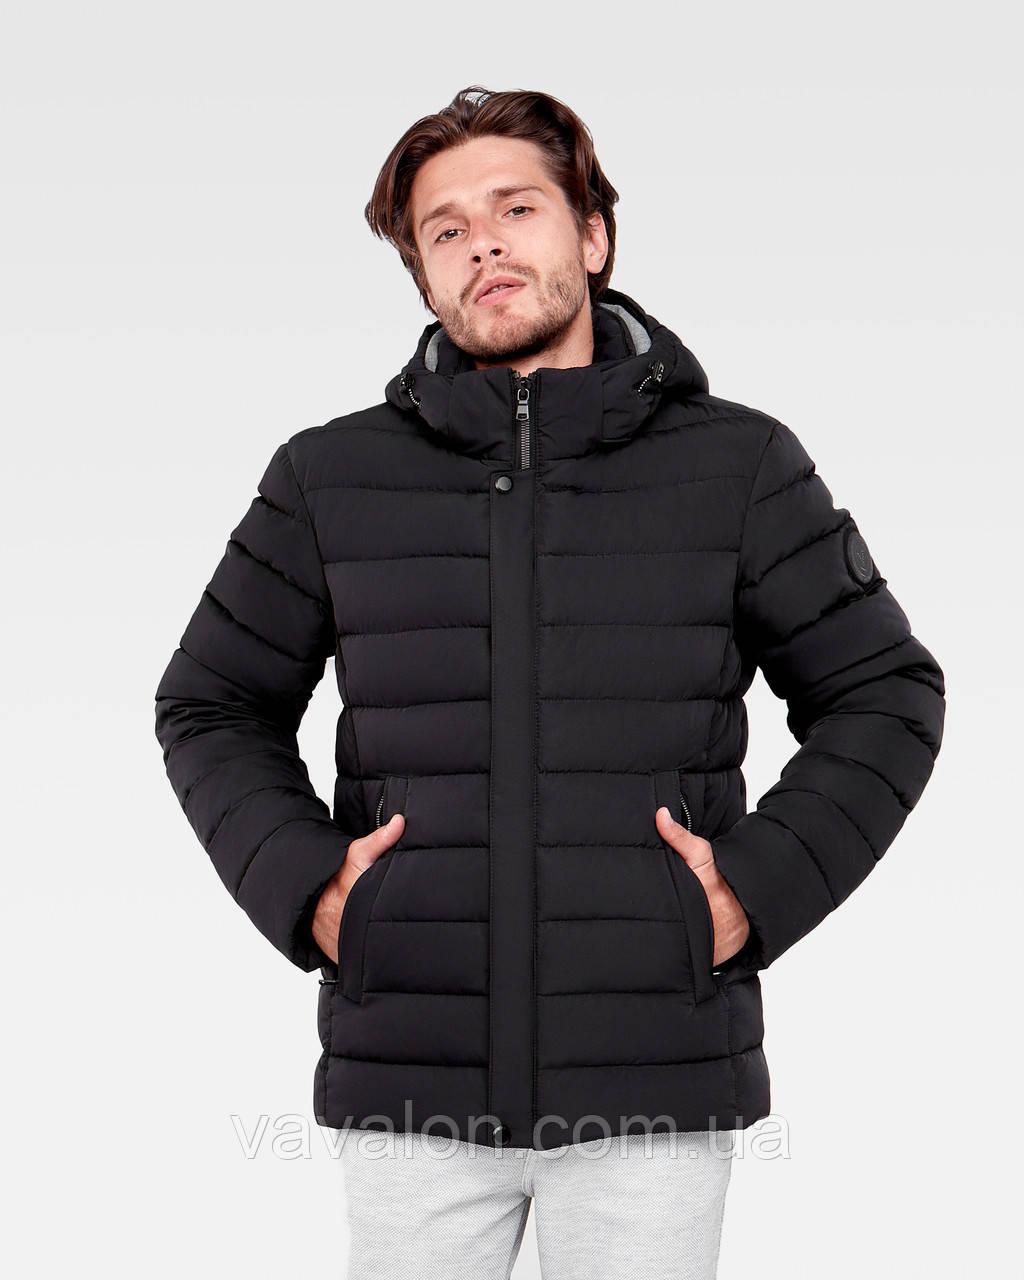 Зимняя мужская куртка Vavalon KZ-P247 Black